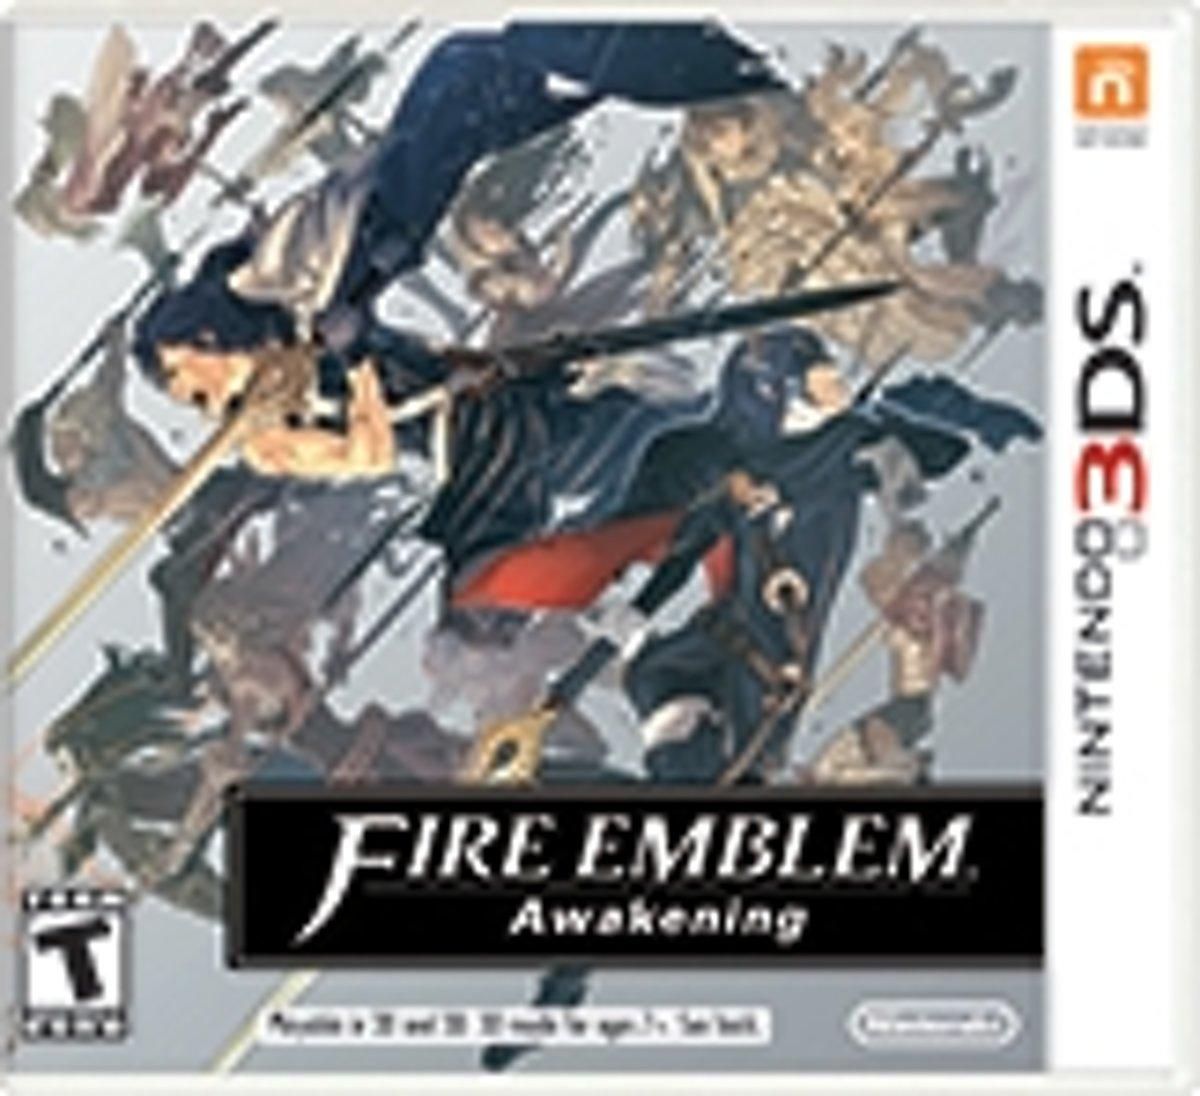 Nintendo Fire Emblem: Awakening 3DS Basis Nintendo 3DS Engels video-game kopen